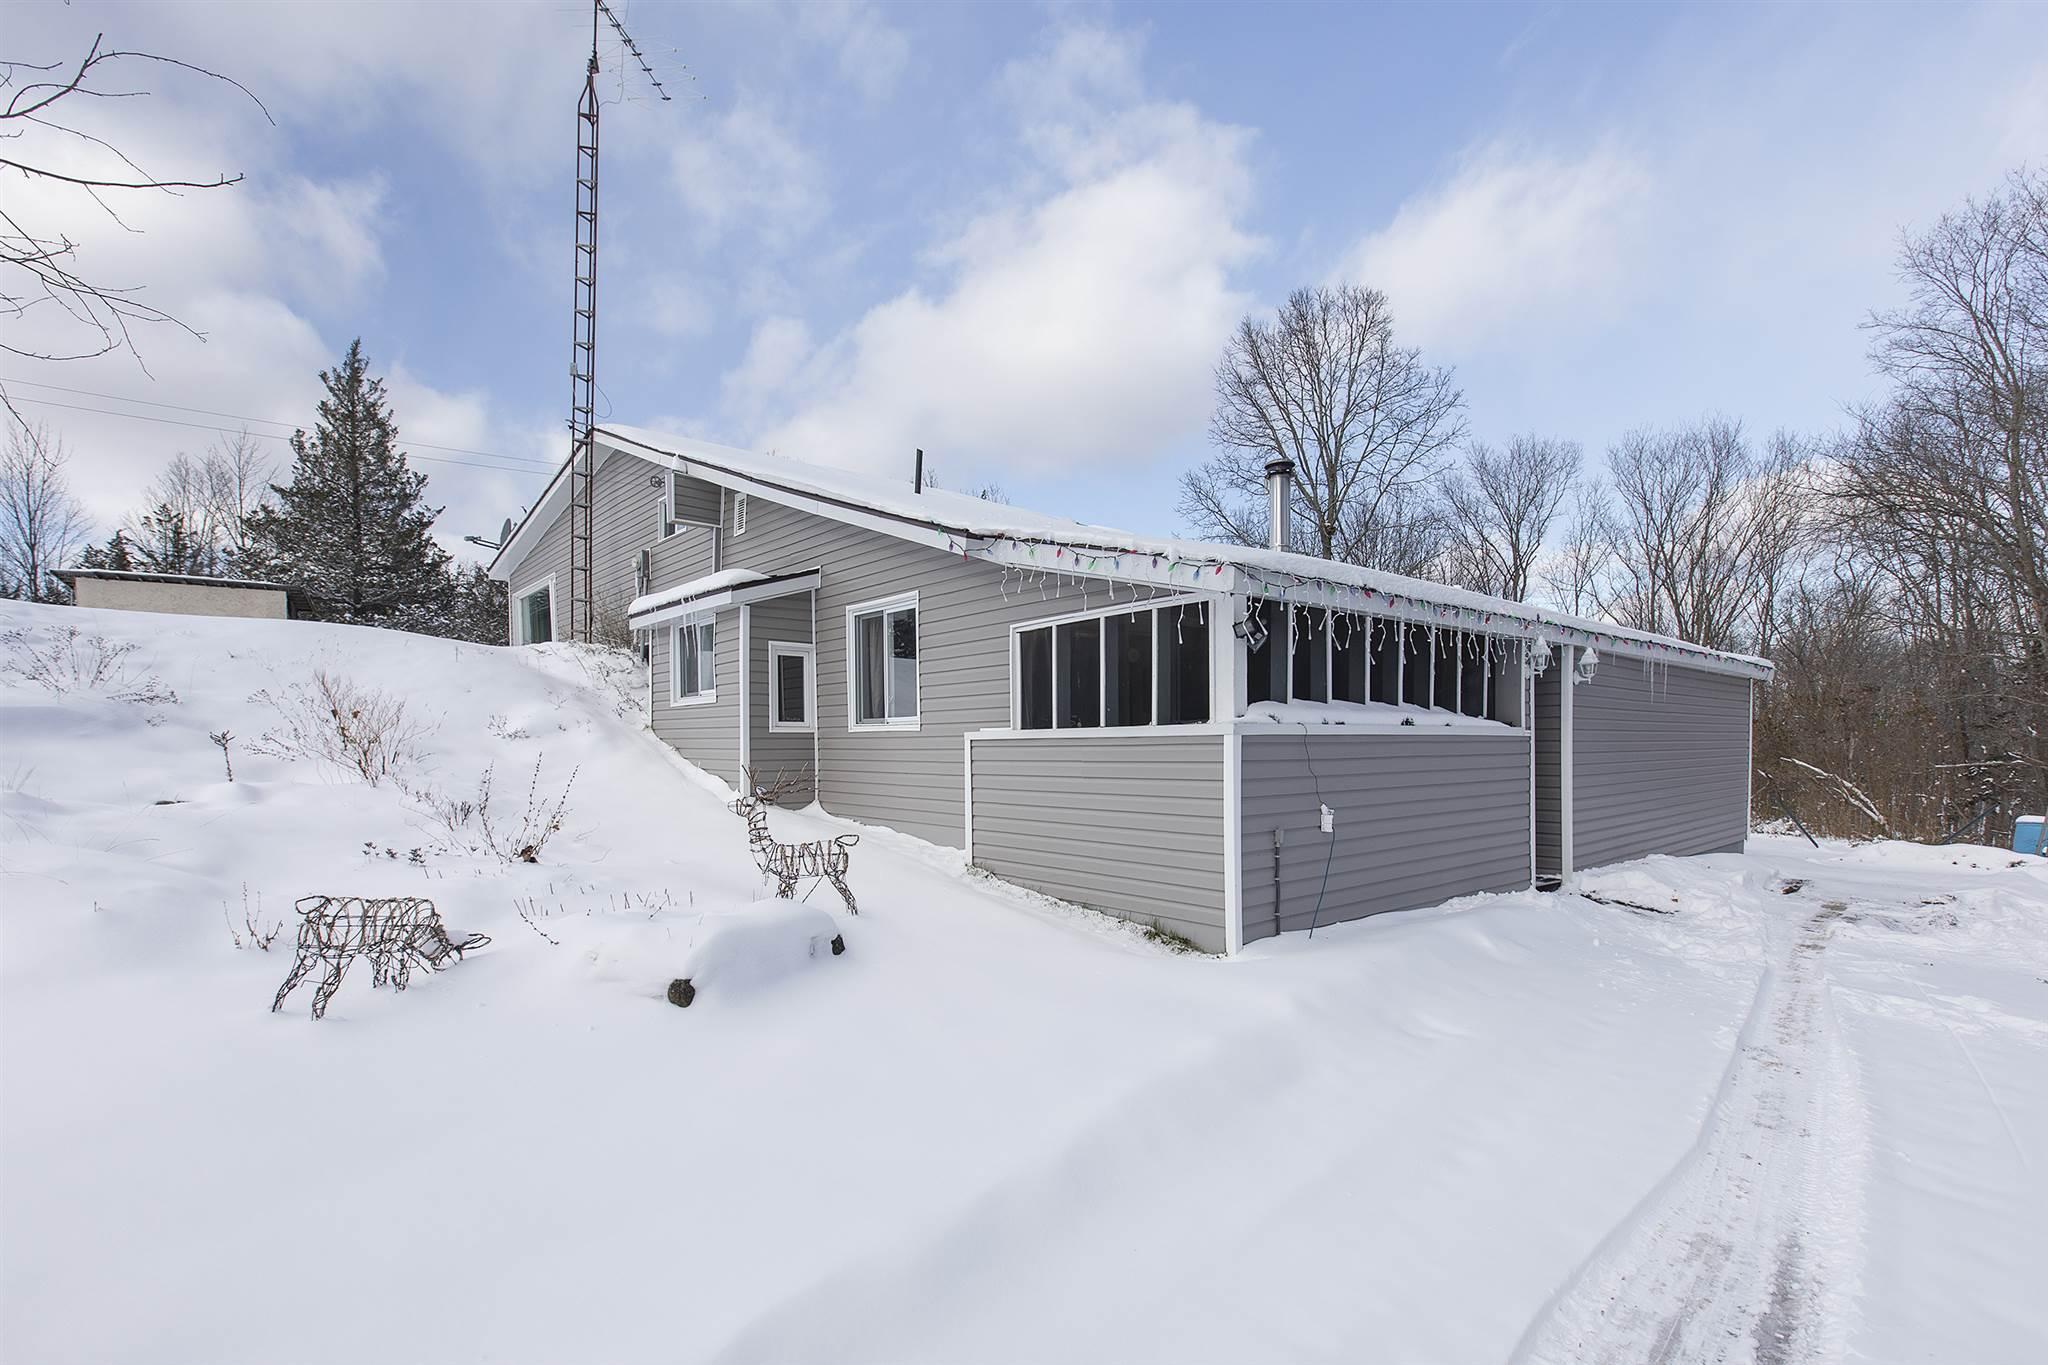 515 Gananoque Lake Road, Leeds & 1000 Islands Township, Ontario, Canada